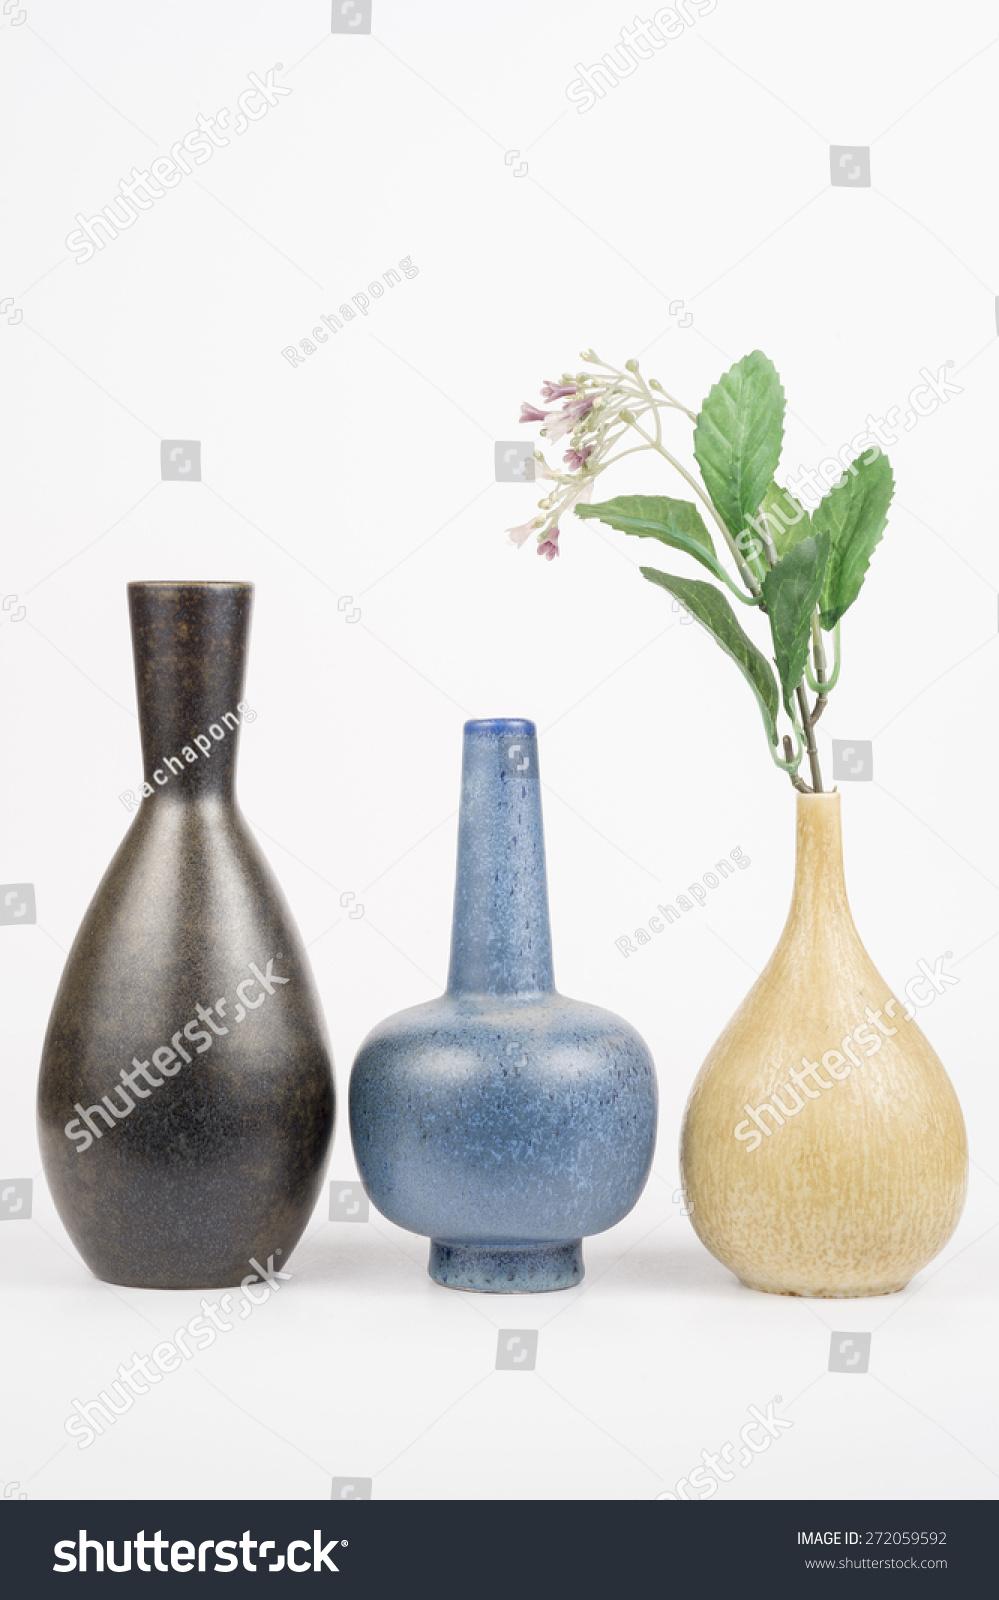 Decorative swedishs vintage ceramic vase flowers stock photo decorative swedishs vintage ceramic vase with flowers on white background reviewsmspy